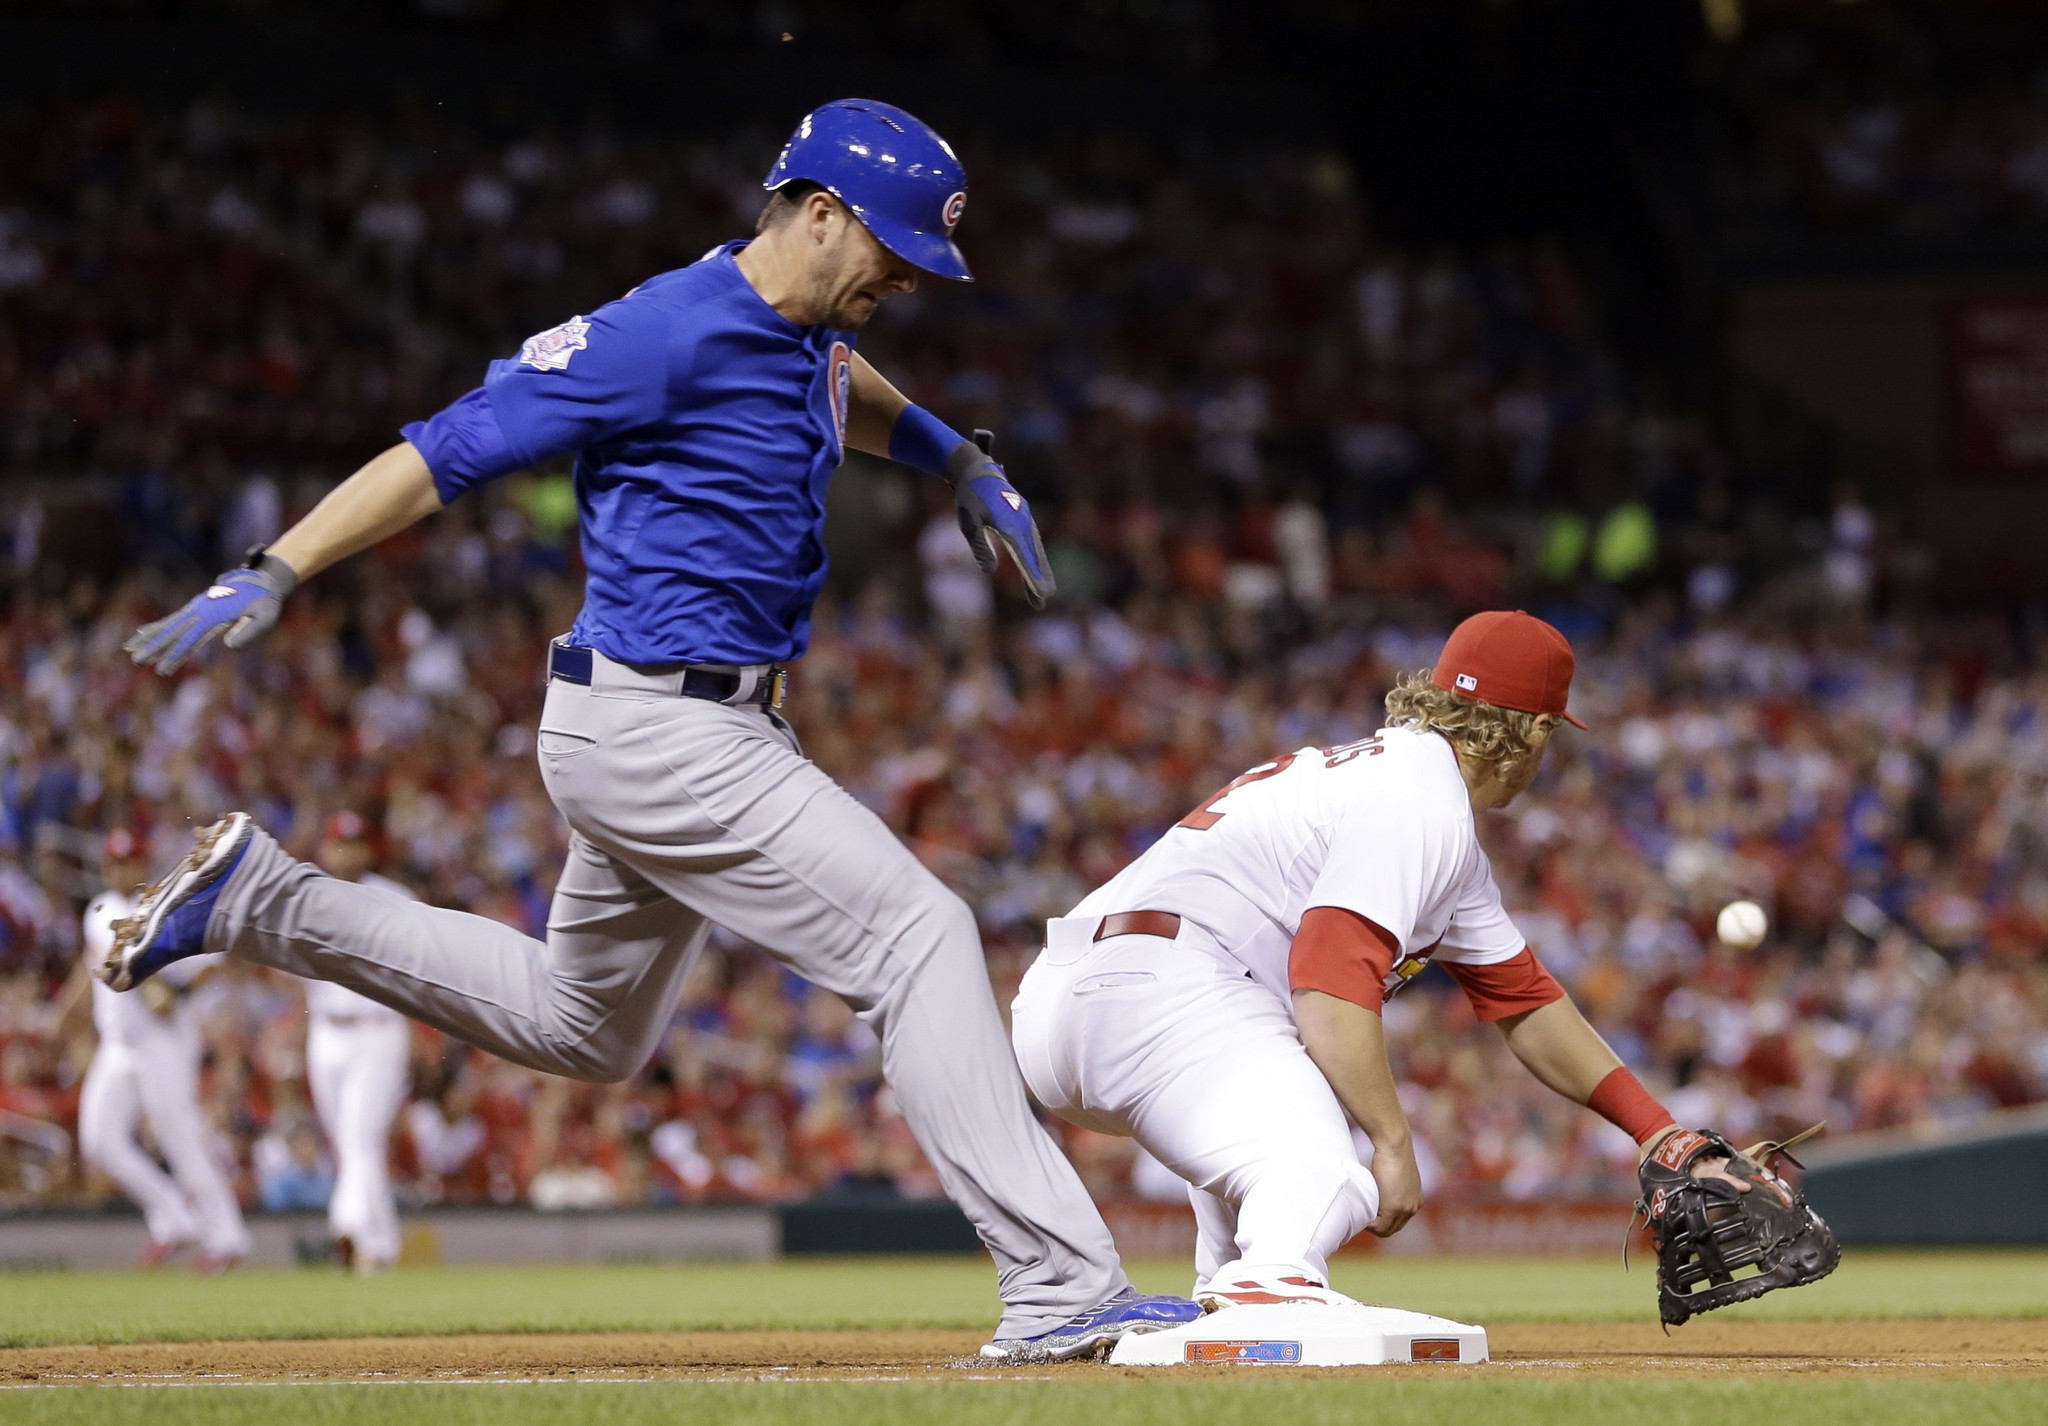 cubs cardinals kris bryant series chicago ct preview place baseball better den